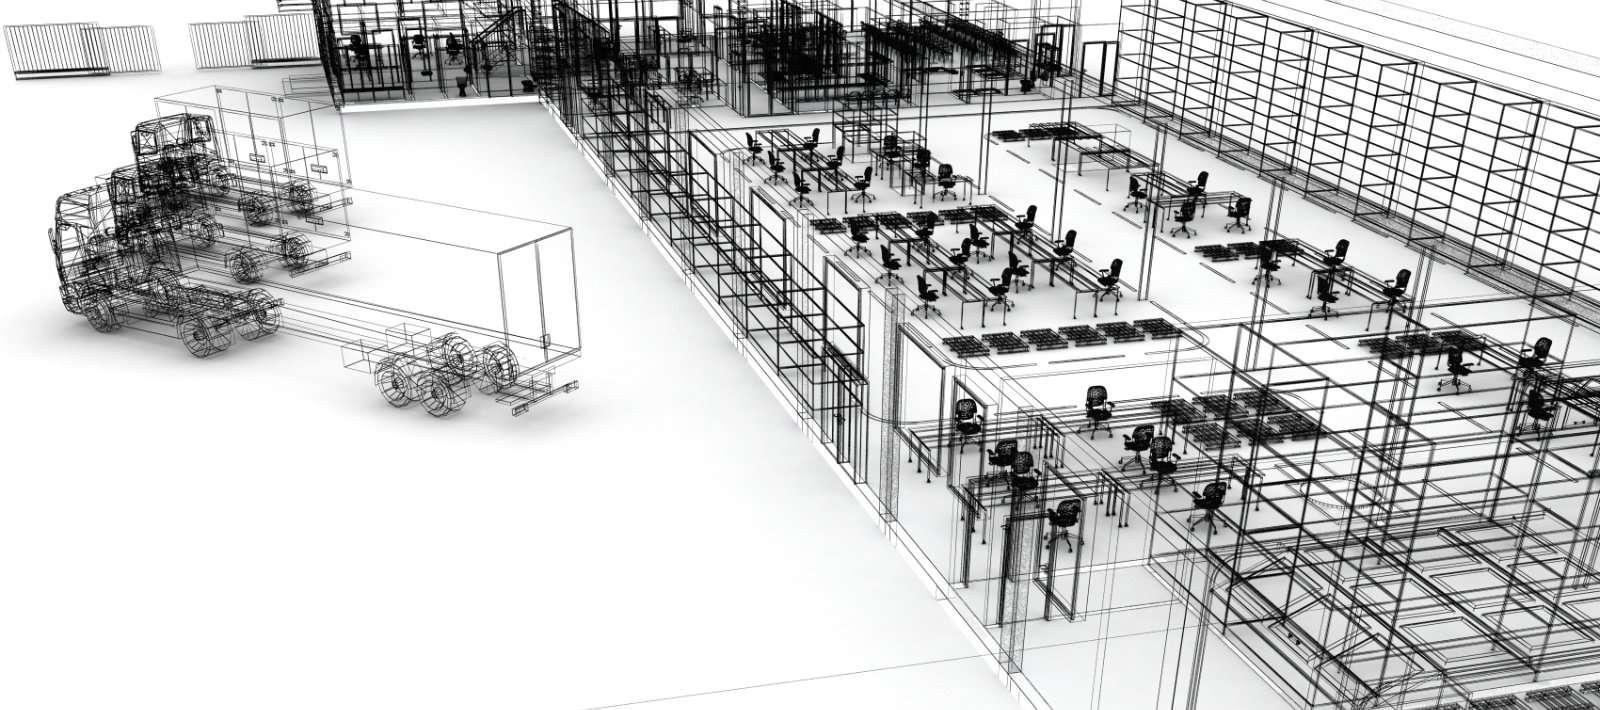 Logistics Management Systems: How Warehouse, Transportation